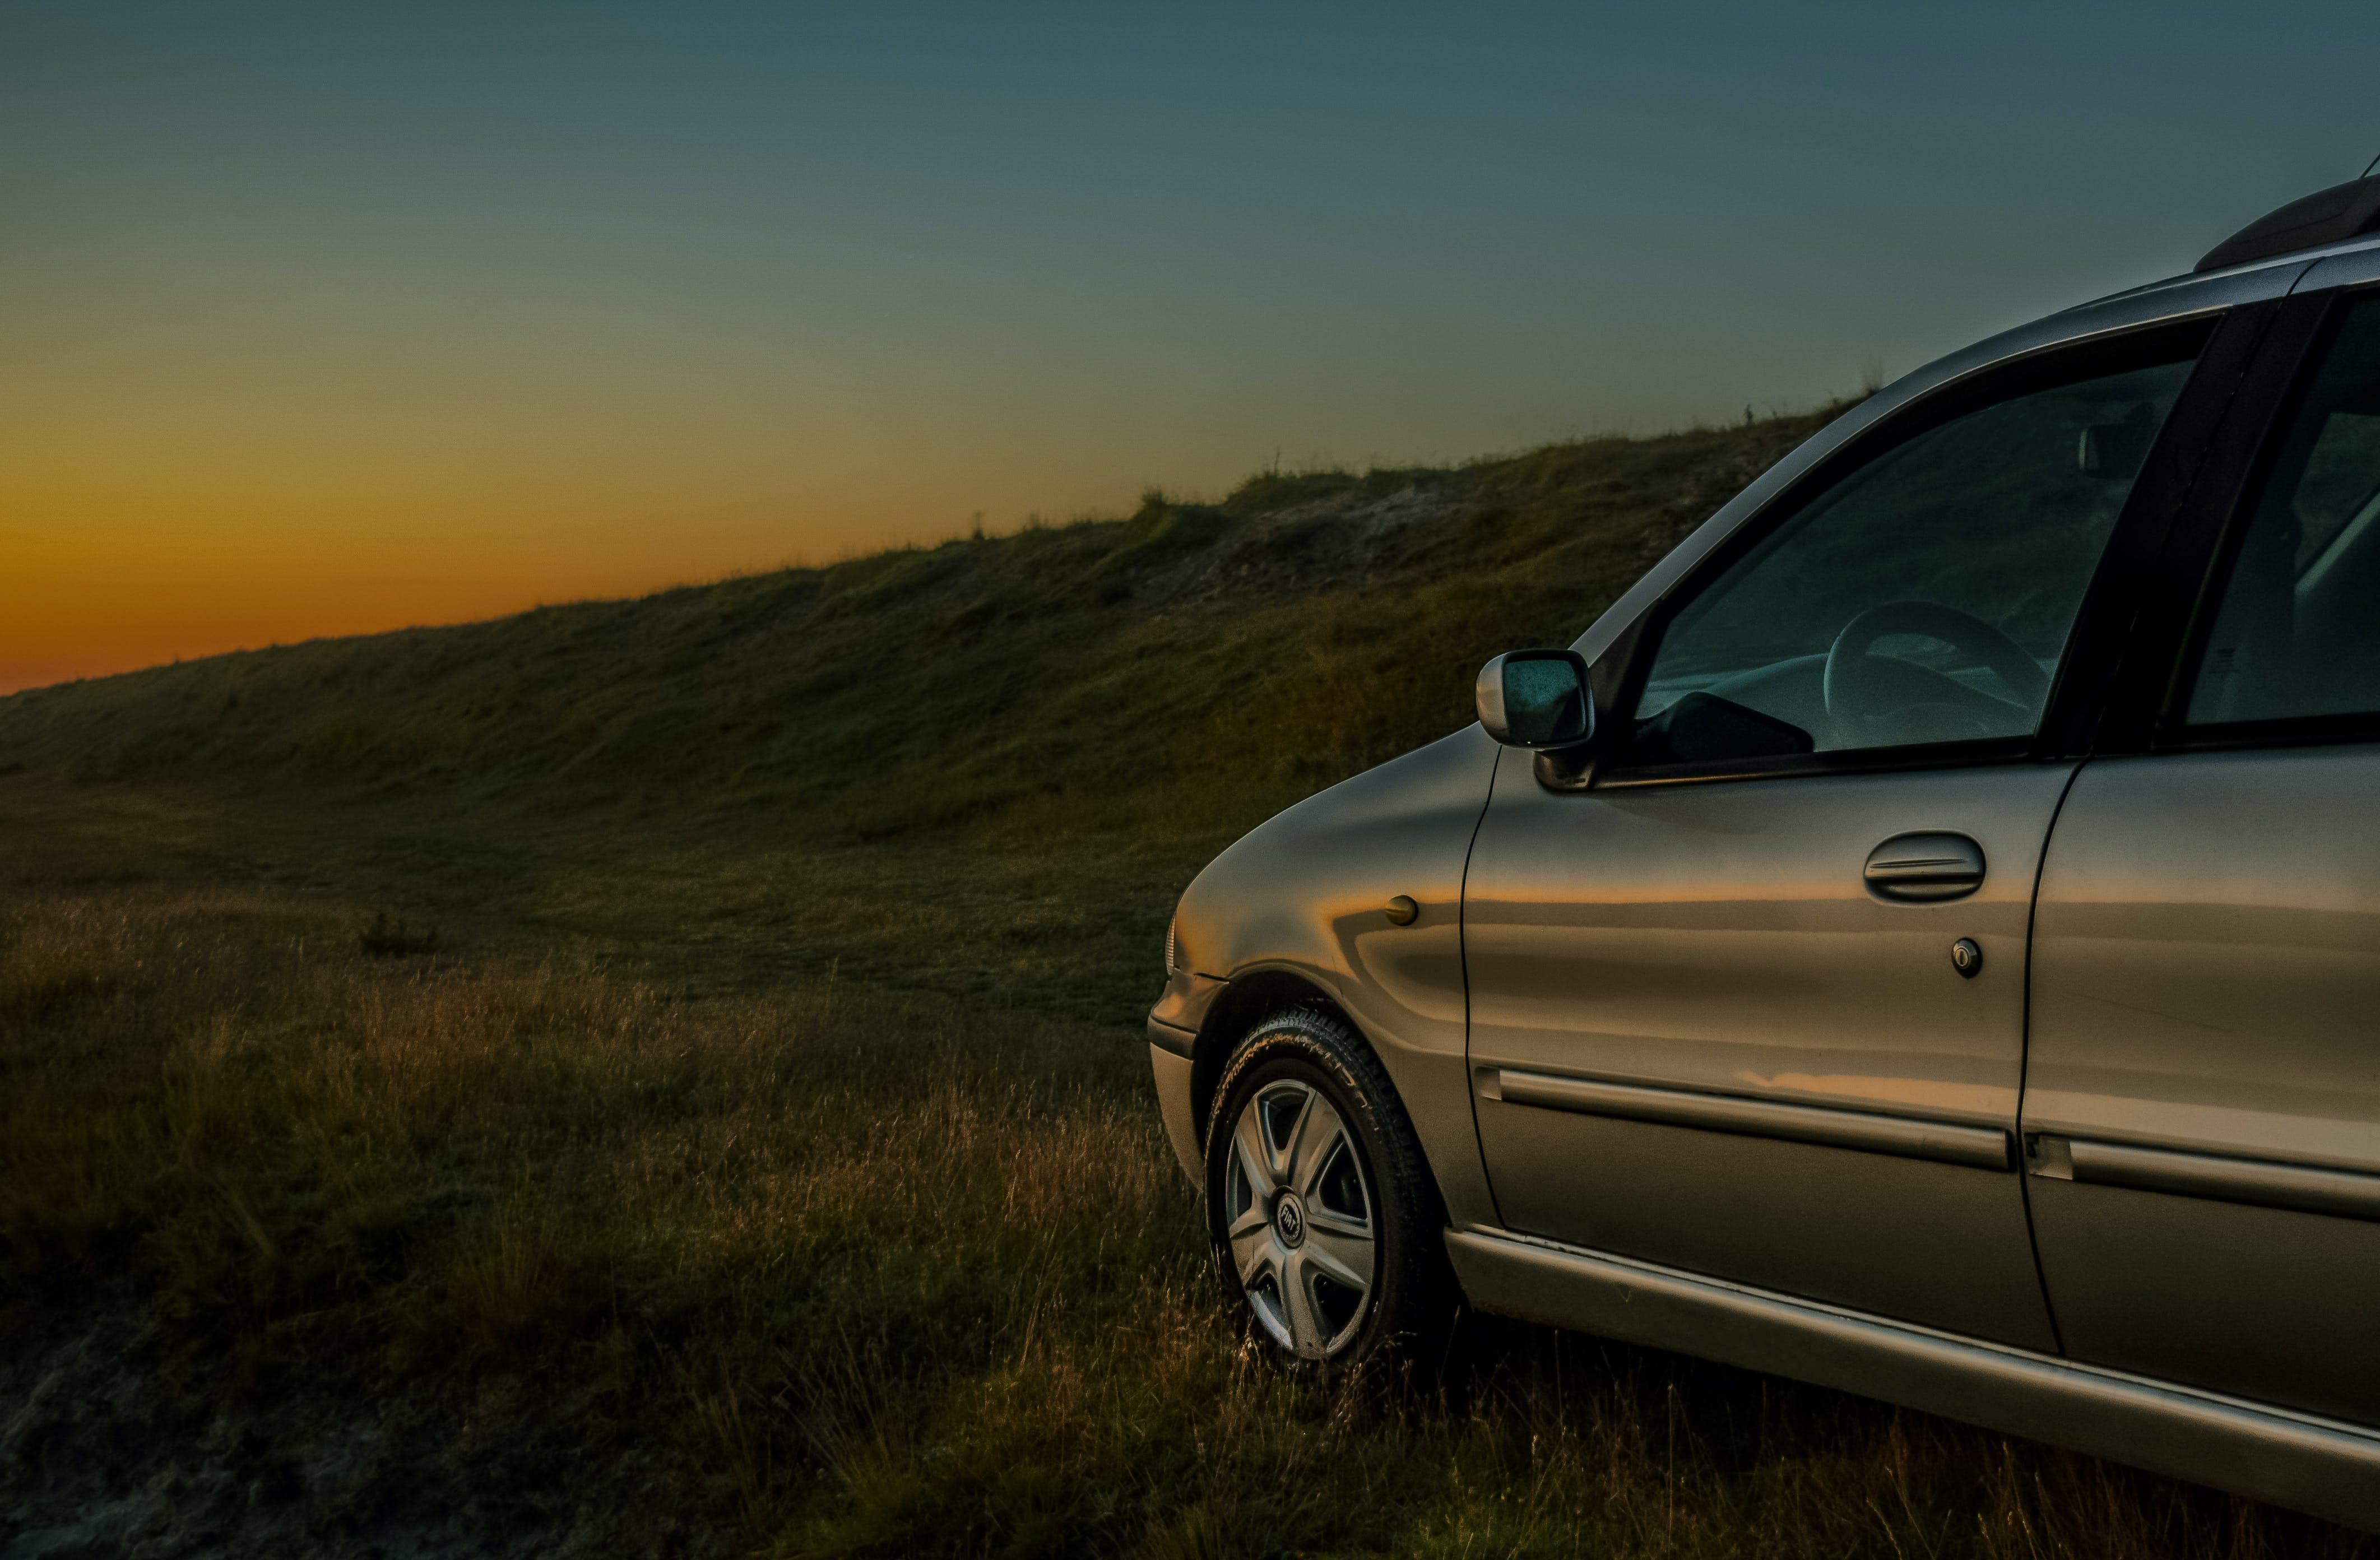 Free stock photo of car, metal, morning, sunrise